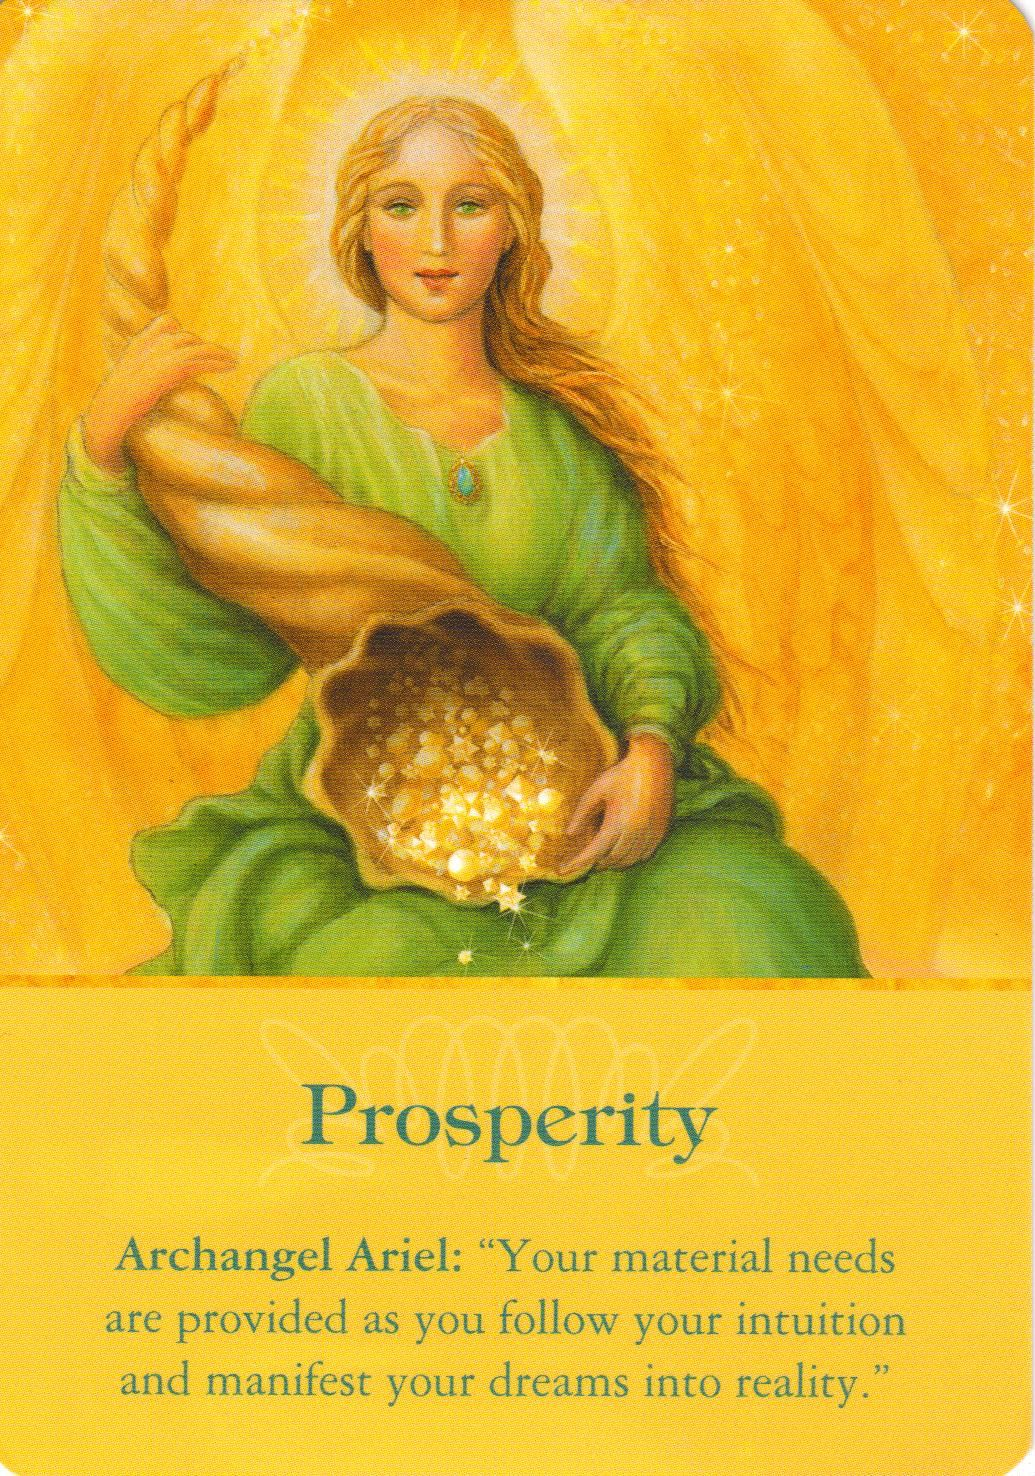 Archangel ariel archangel oracle cards archangels